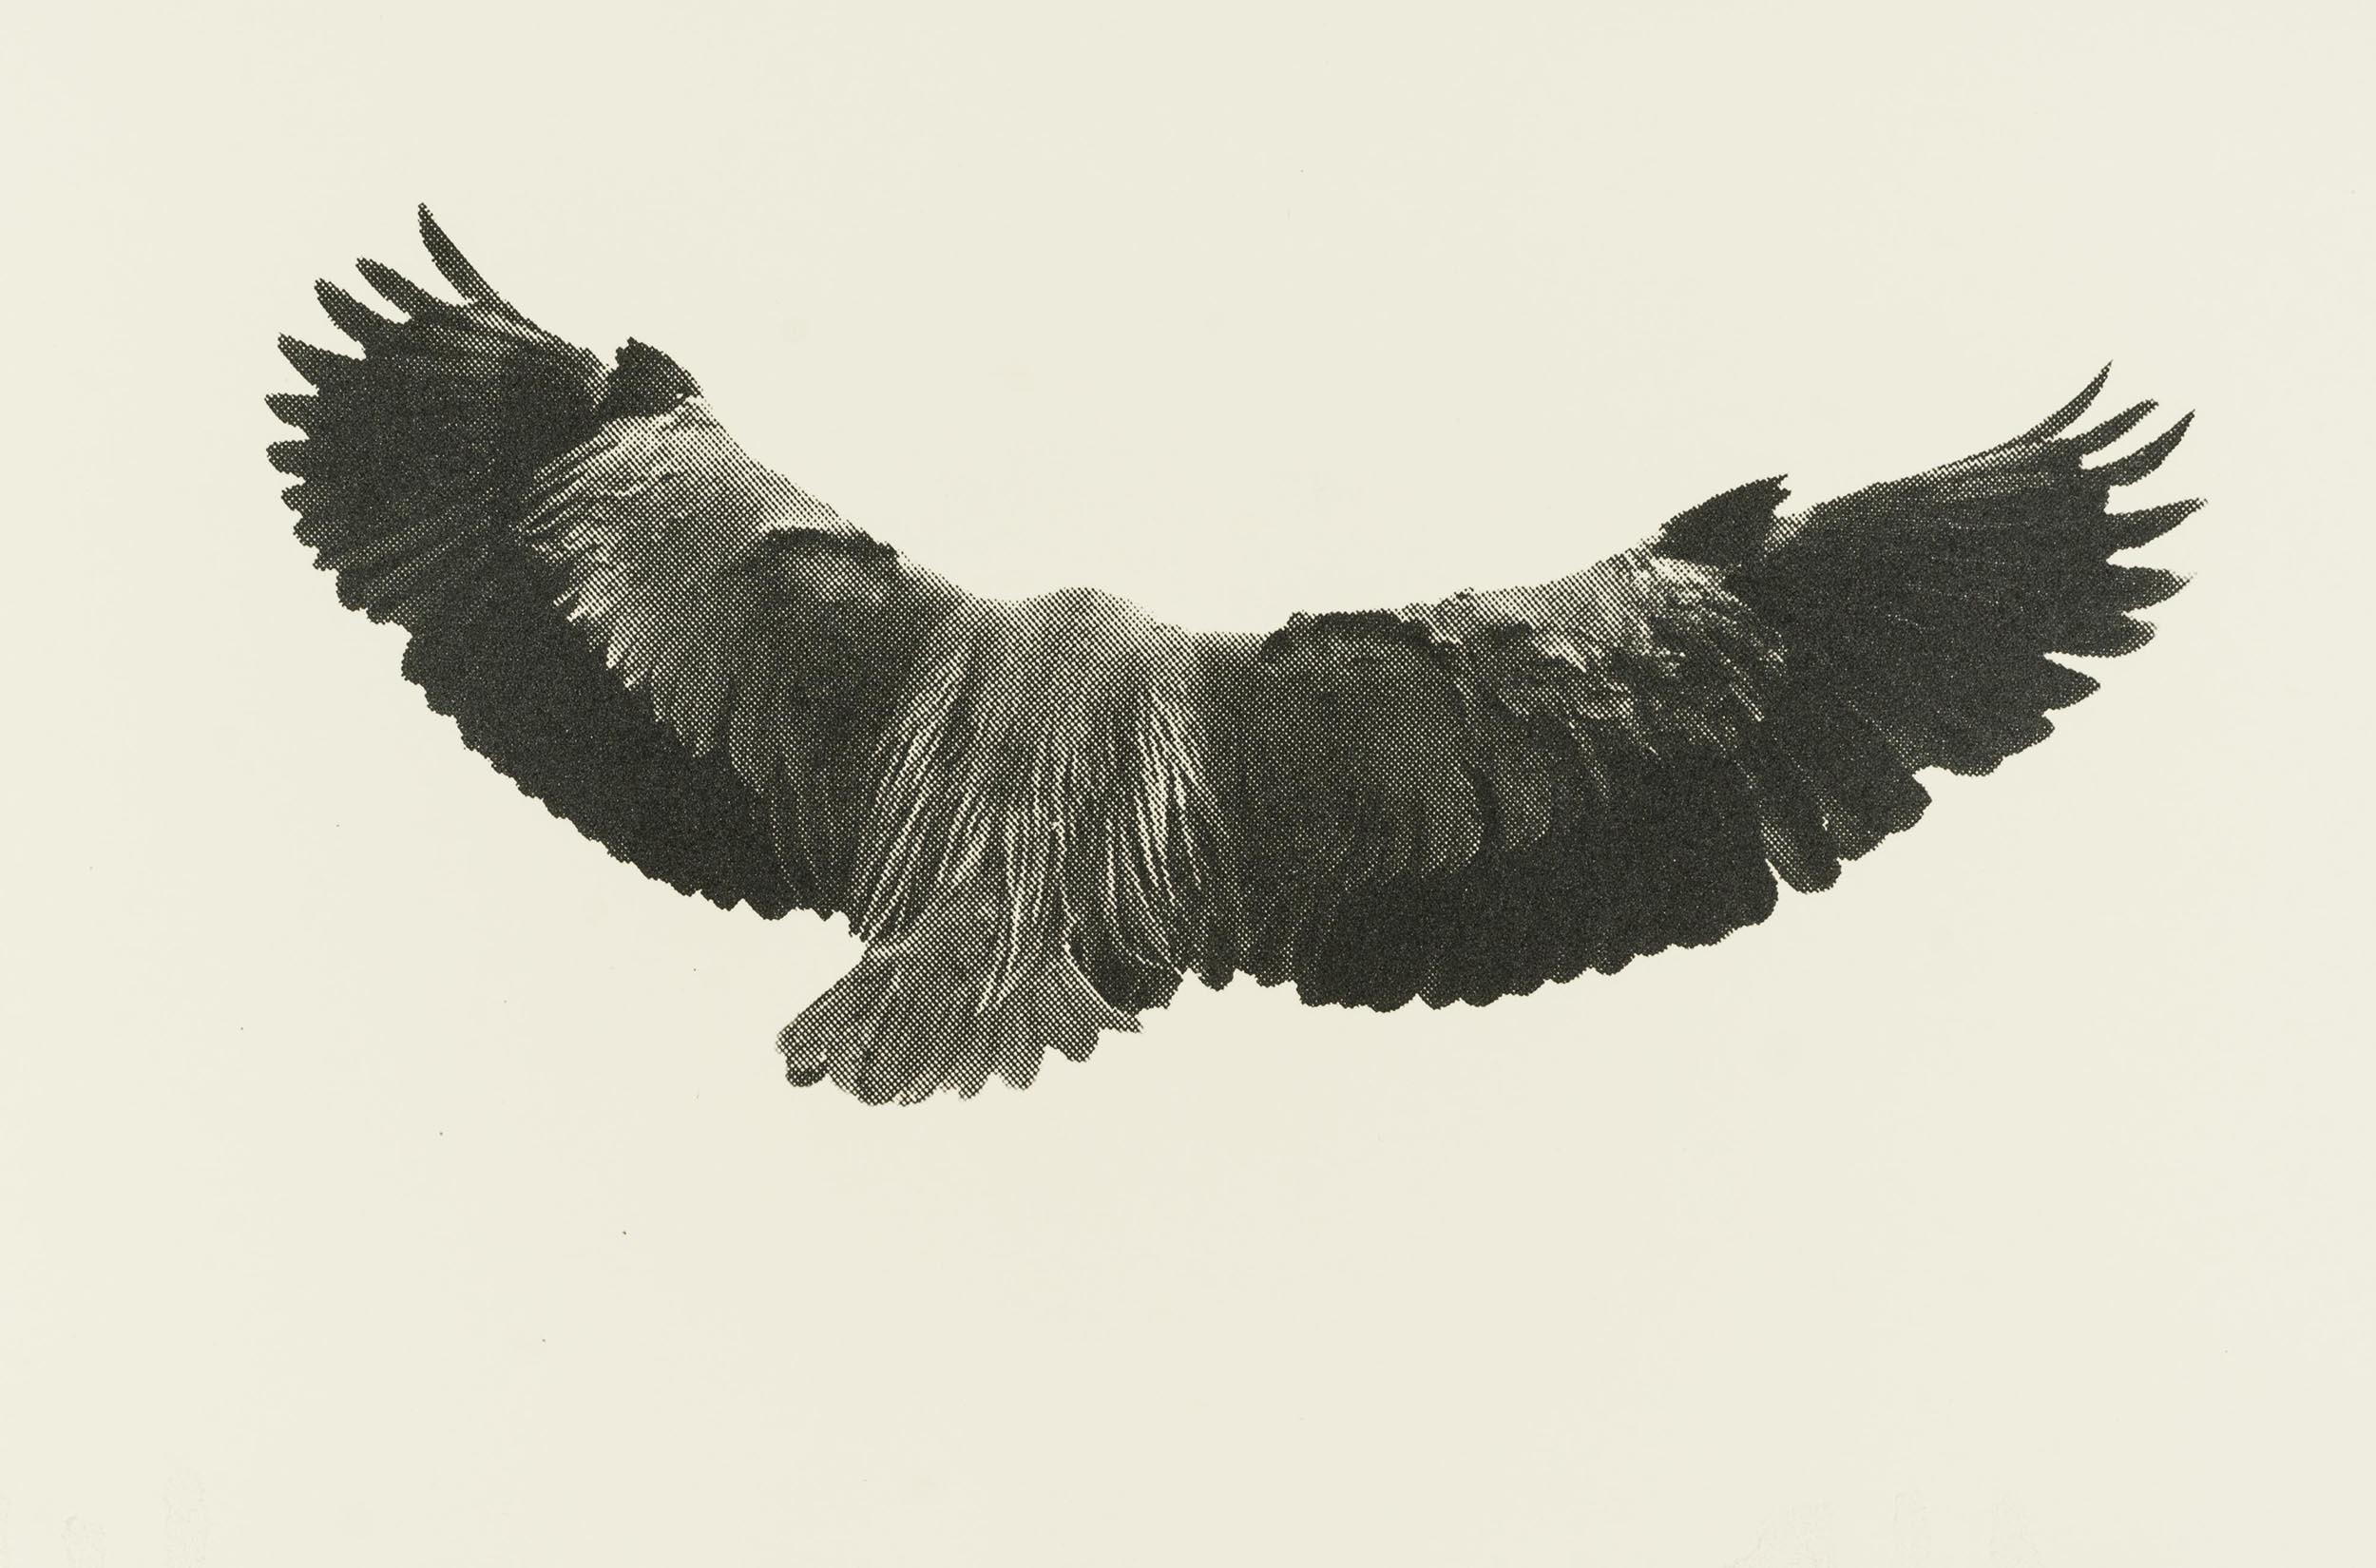 Eve-Biddle-Artworks-Dutchess-Heron-Alone-2017-02